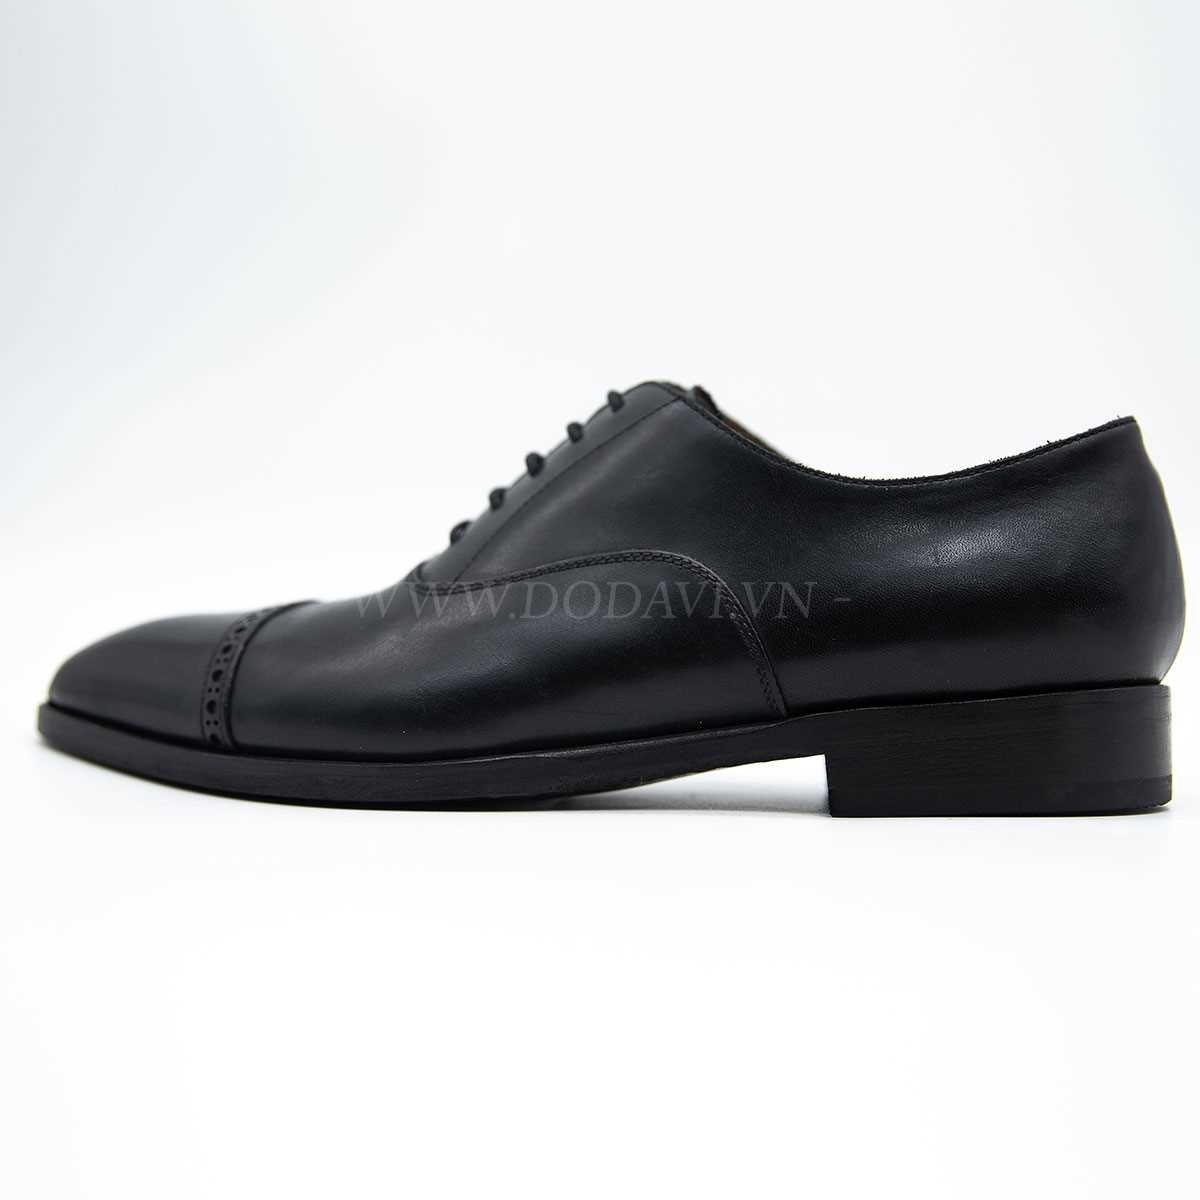 giày đế da 30301.41